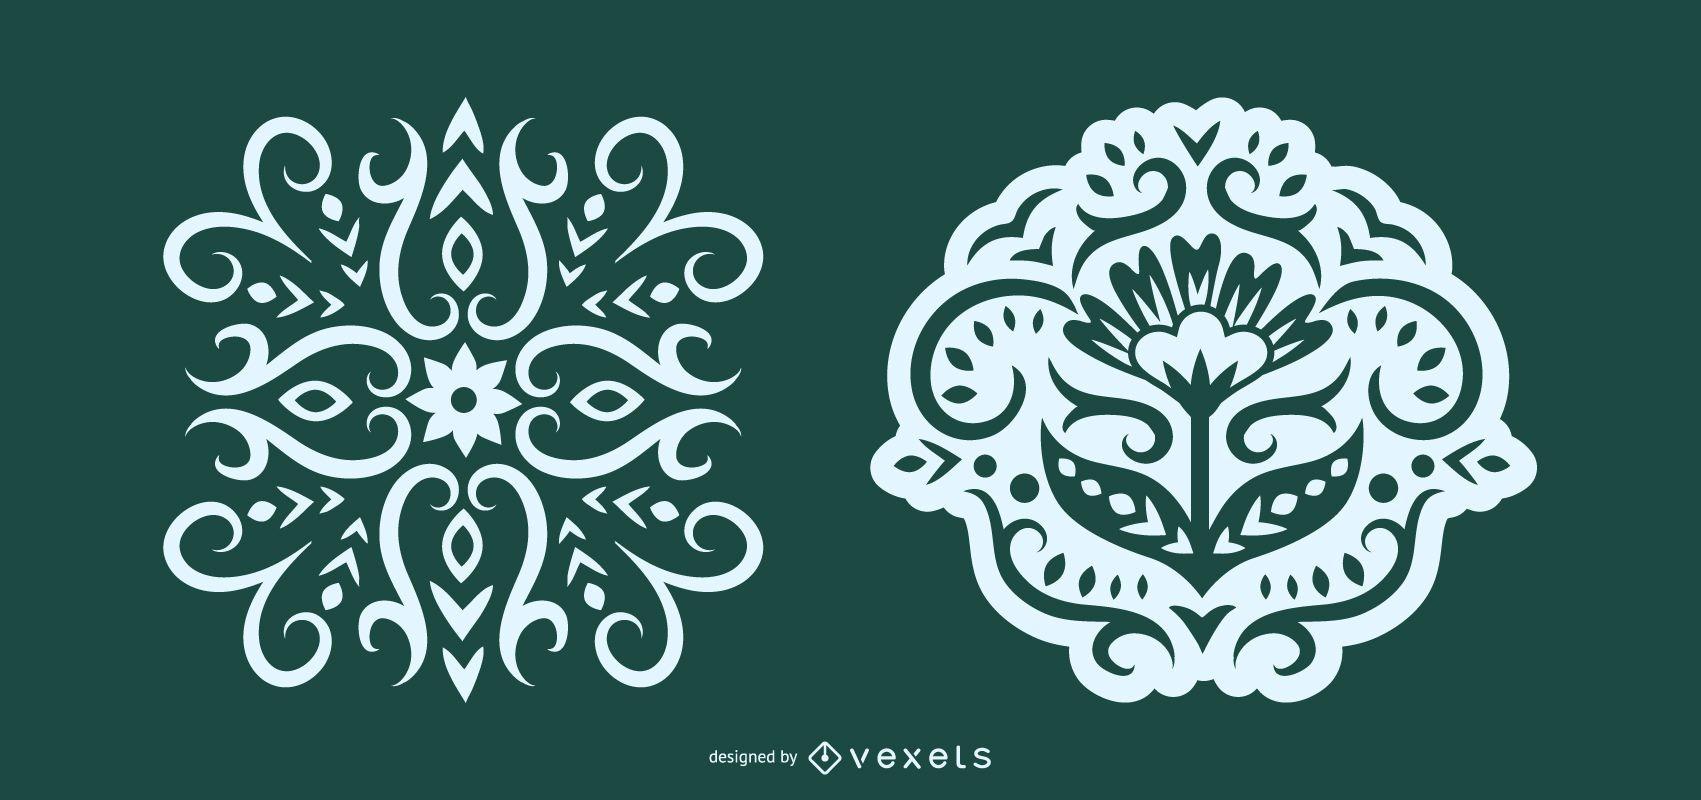 Intricate Scandinavian Folk Illustration